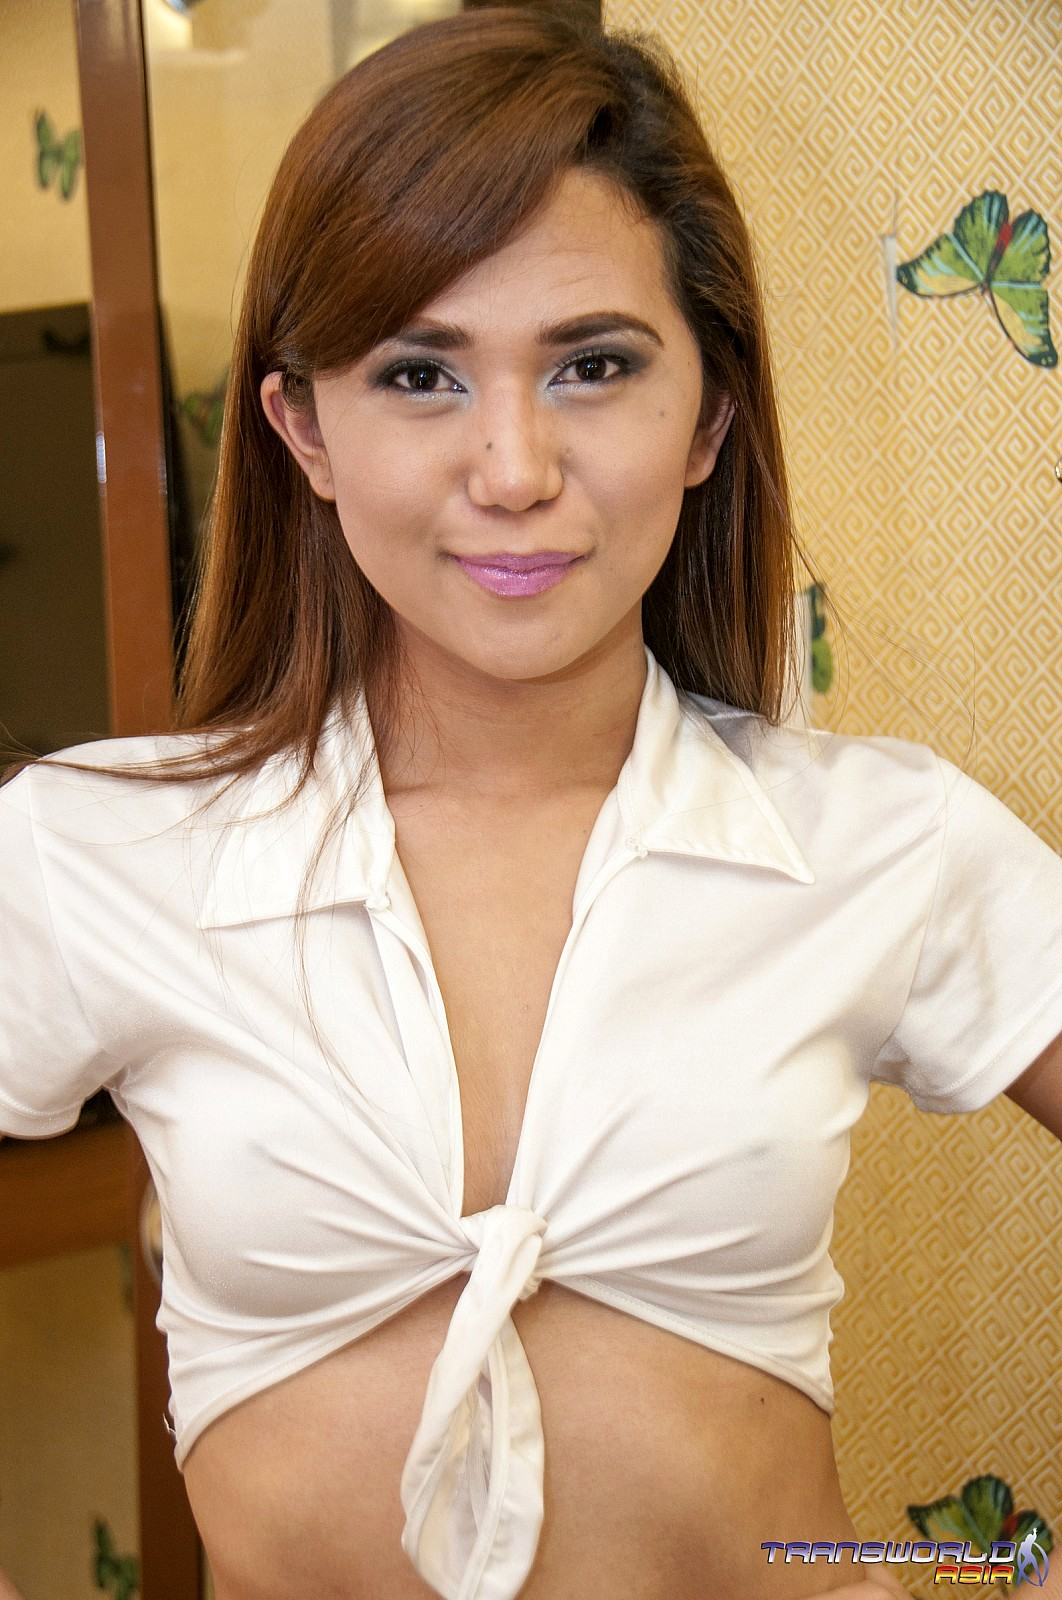 Thai School Girl Tgirl Has A Really Huge She Tool